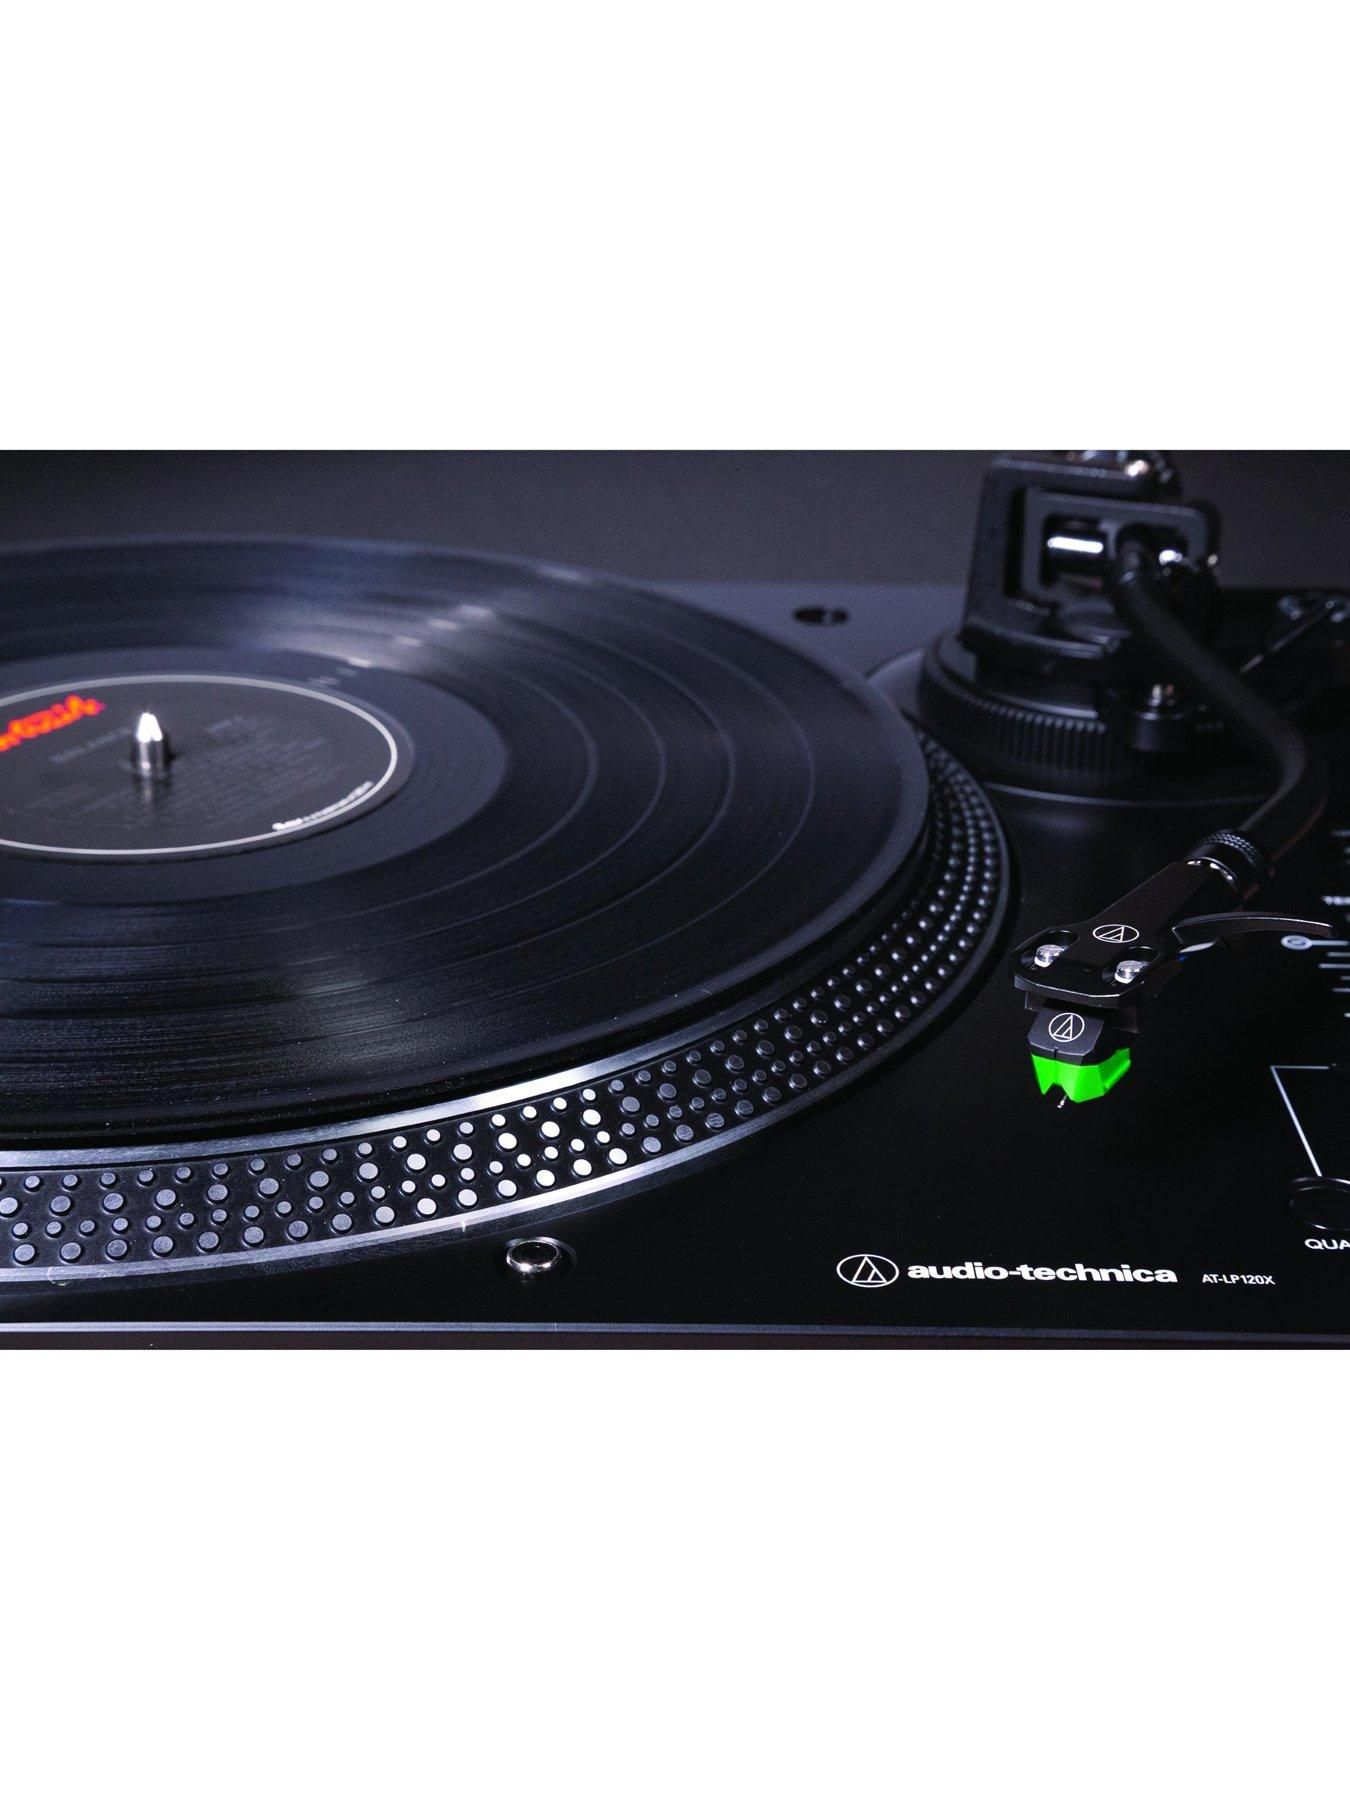 gaixample.org Audio-Technica AT-LP120XUSB Manual Direct-Drive ...